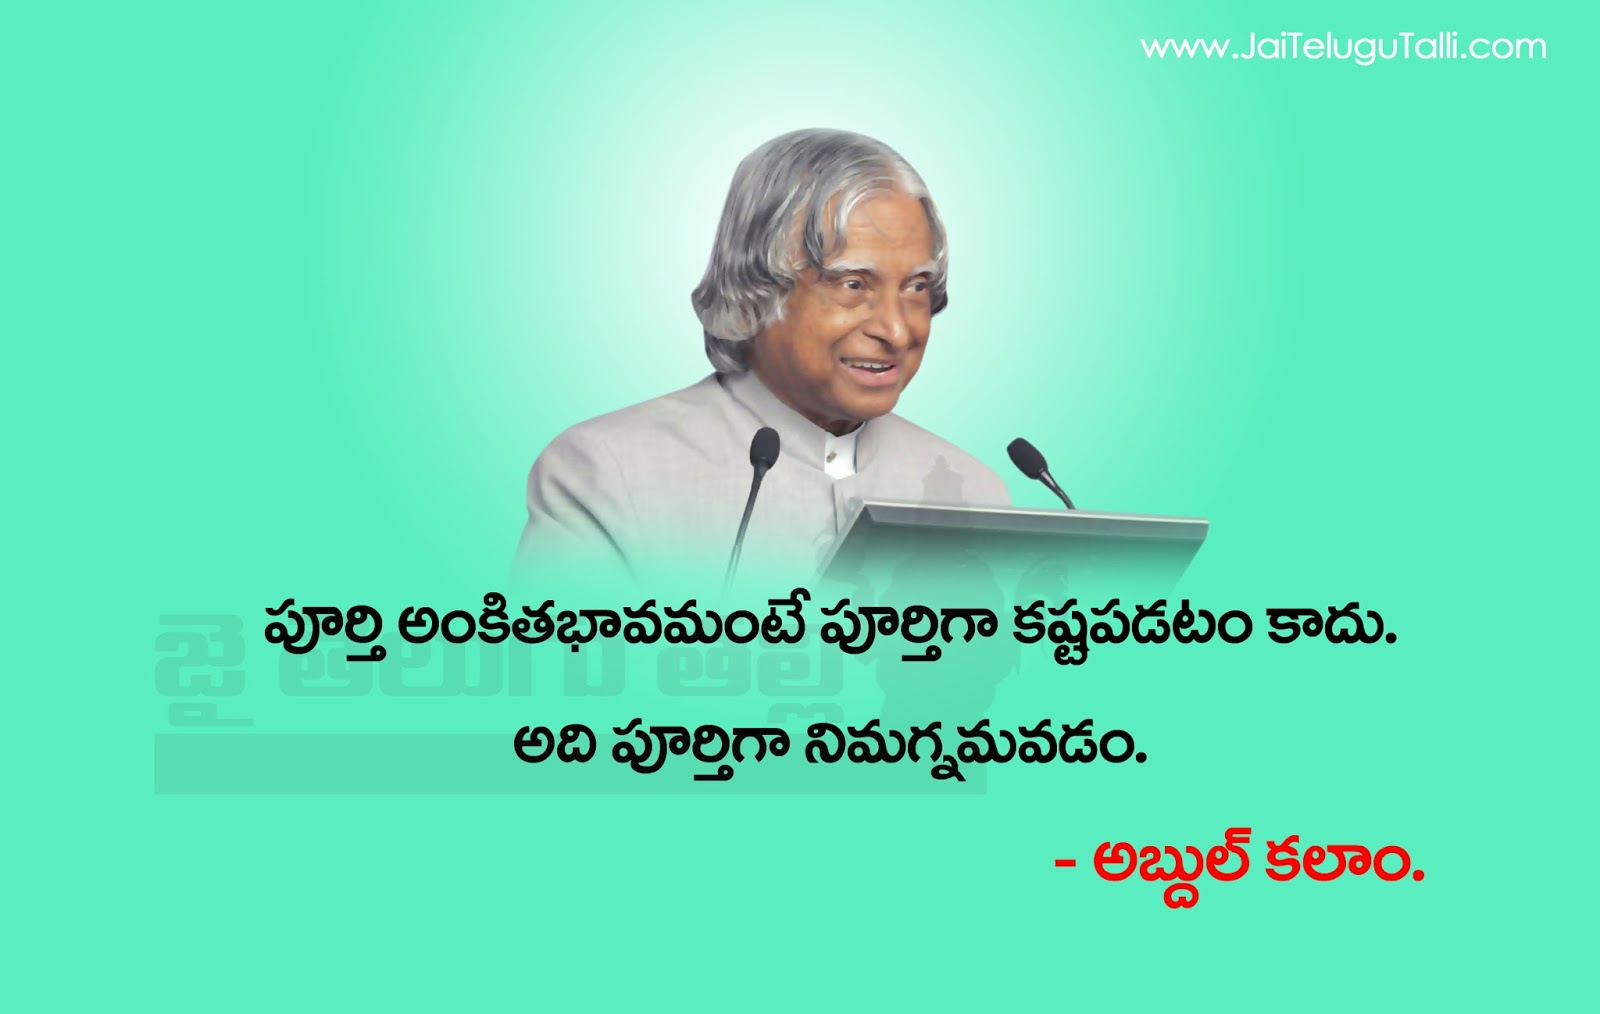 Abdul Kalam Inspirational Quotes And Sayings In Telugu Wallpapers